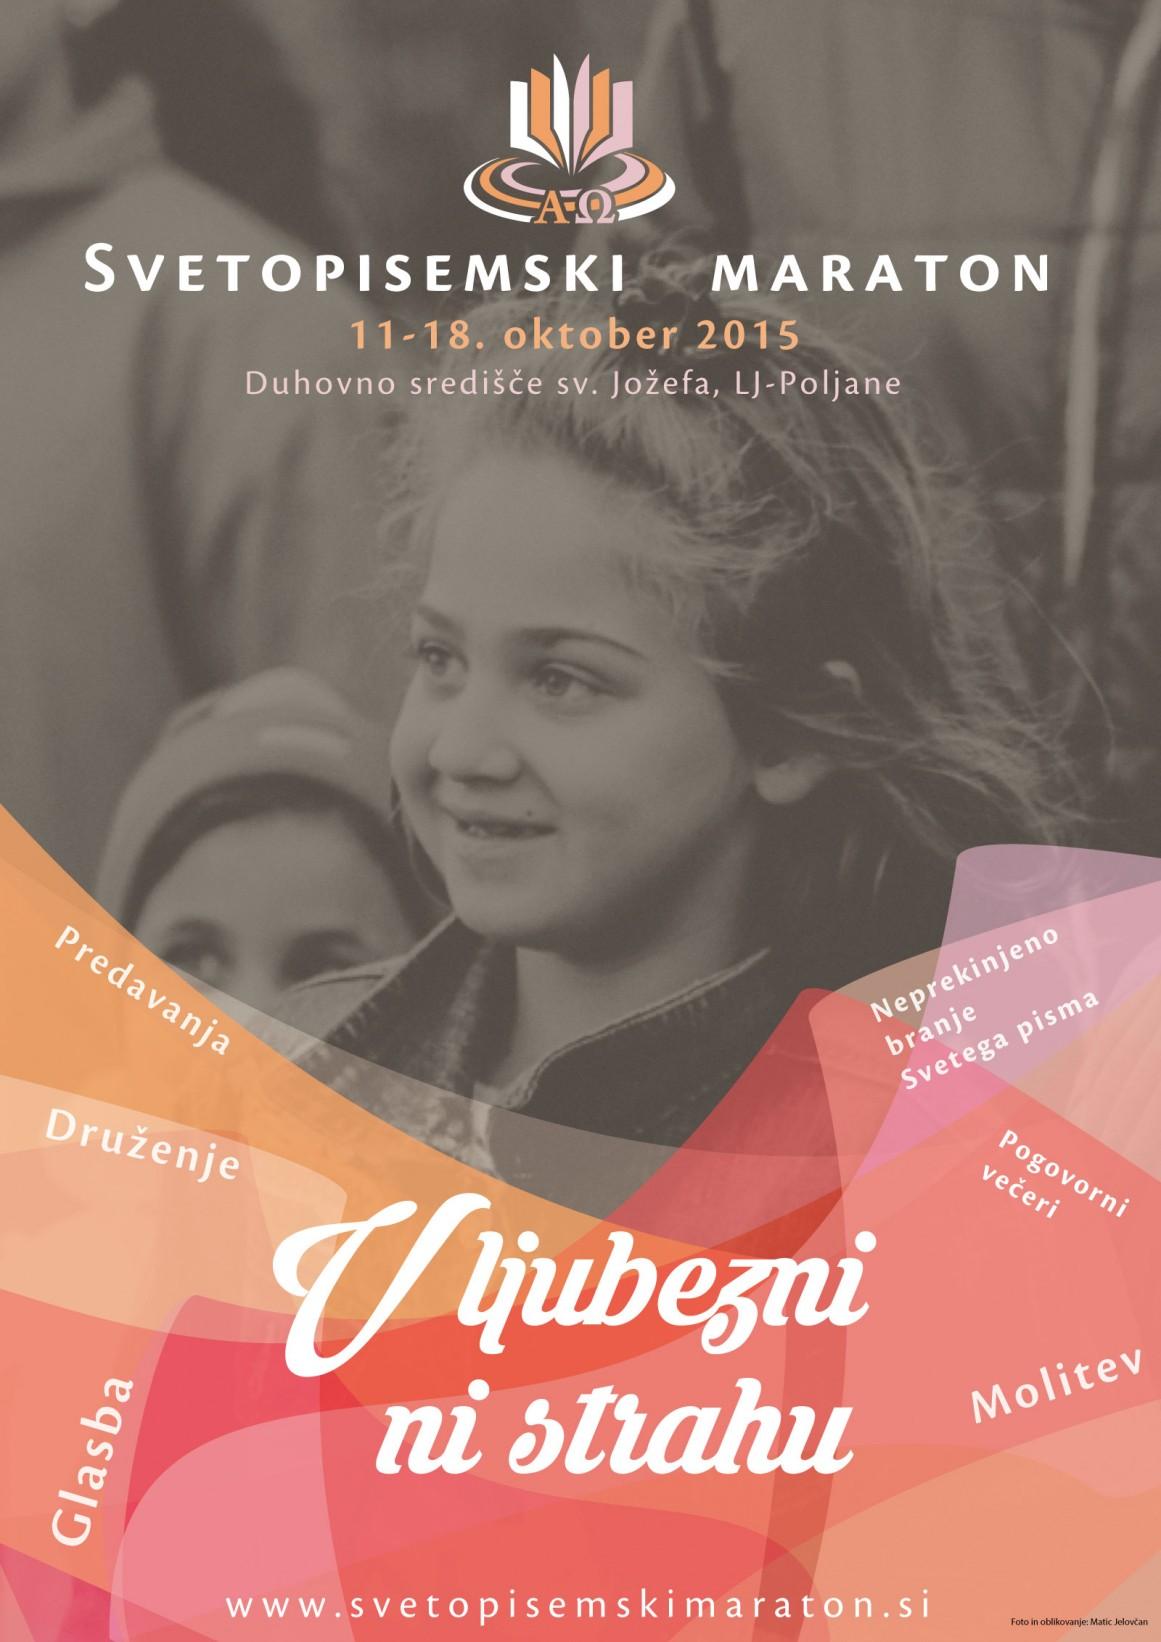 Plakat A3 1161x1642 - Svetopisemski maraton 2015